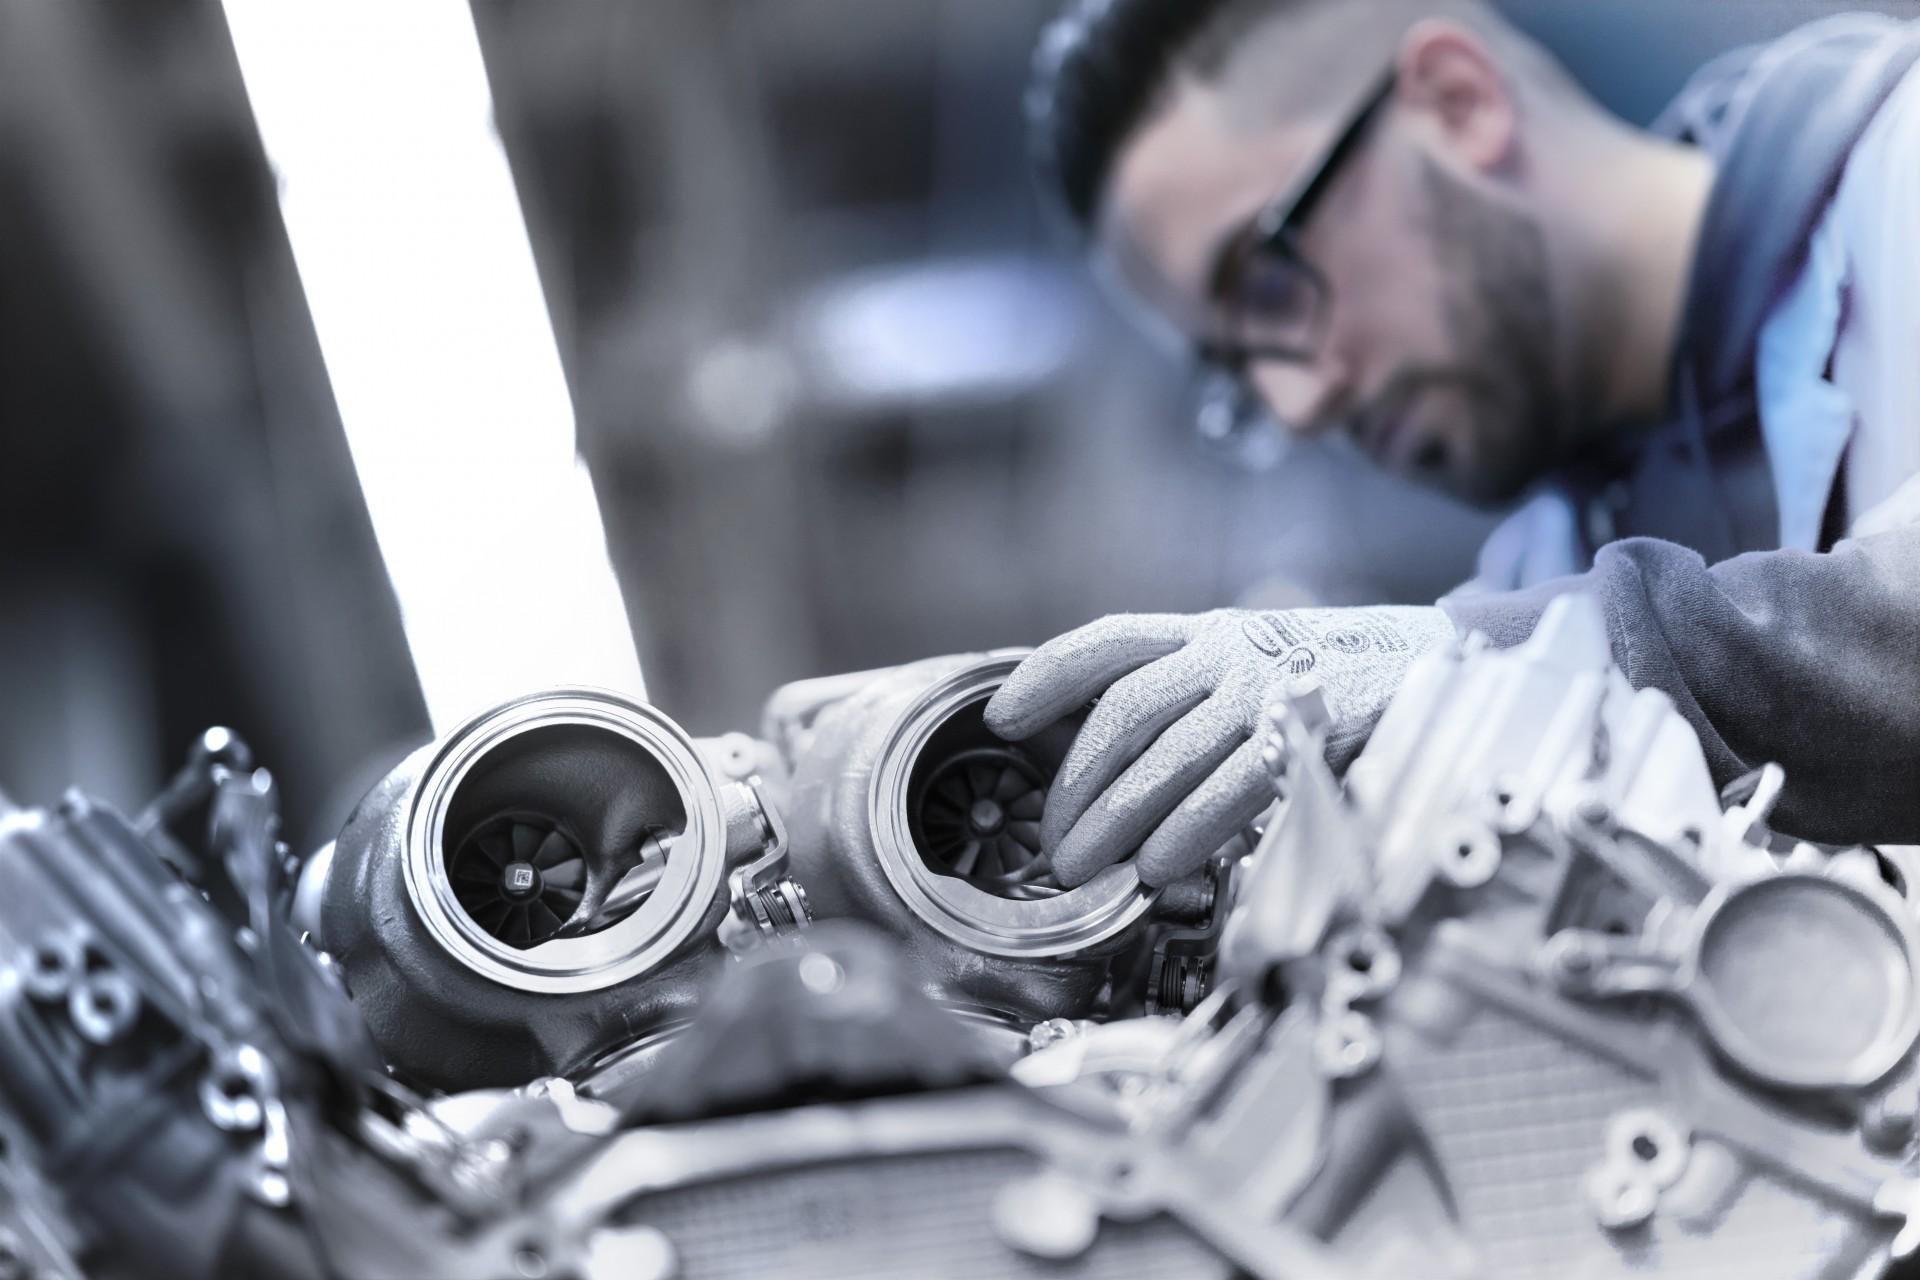 BMW V8 engine 4